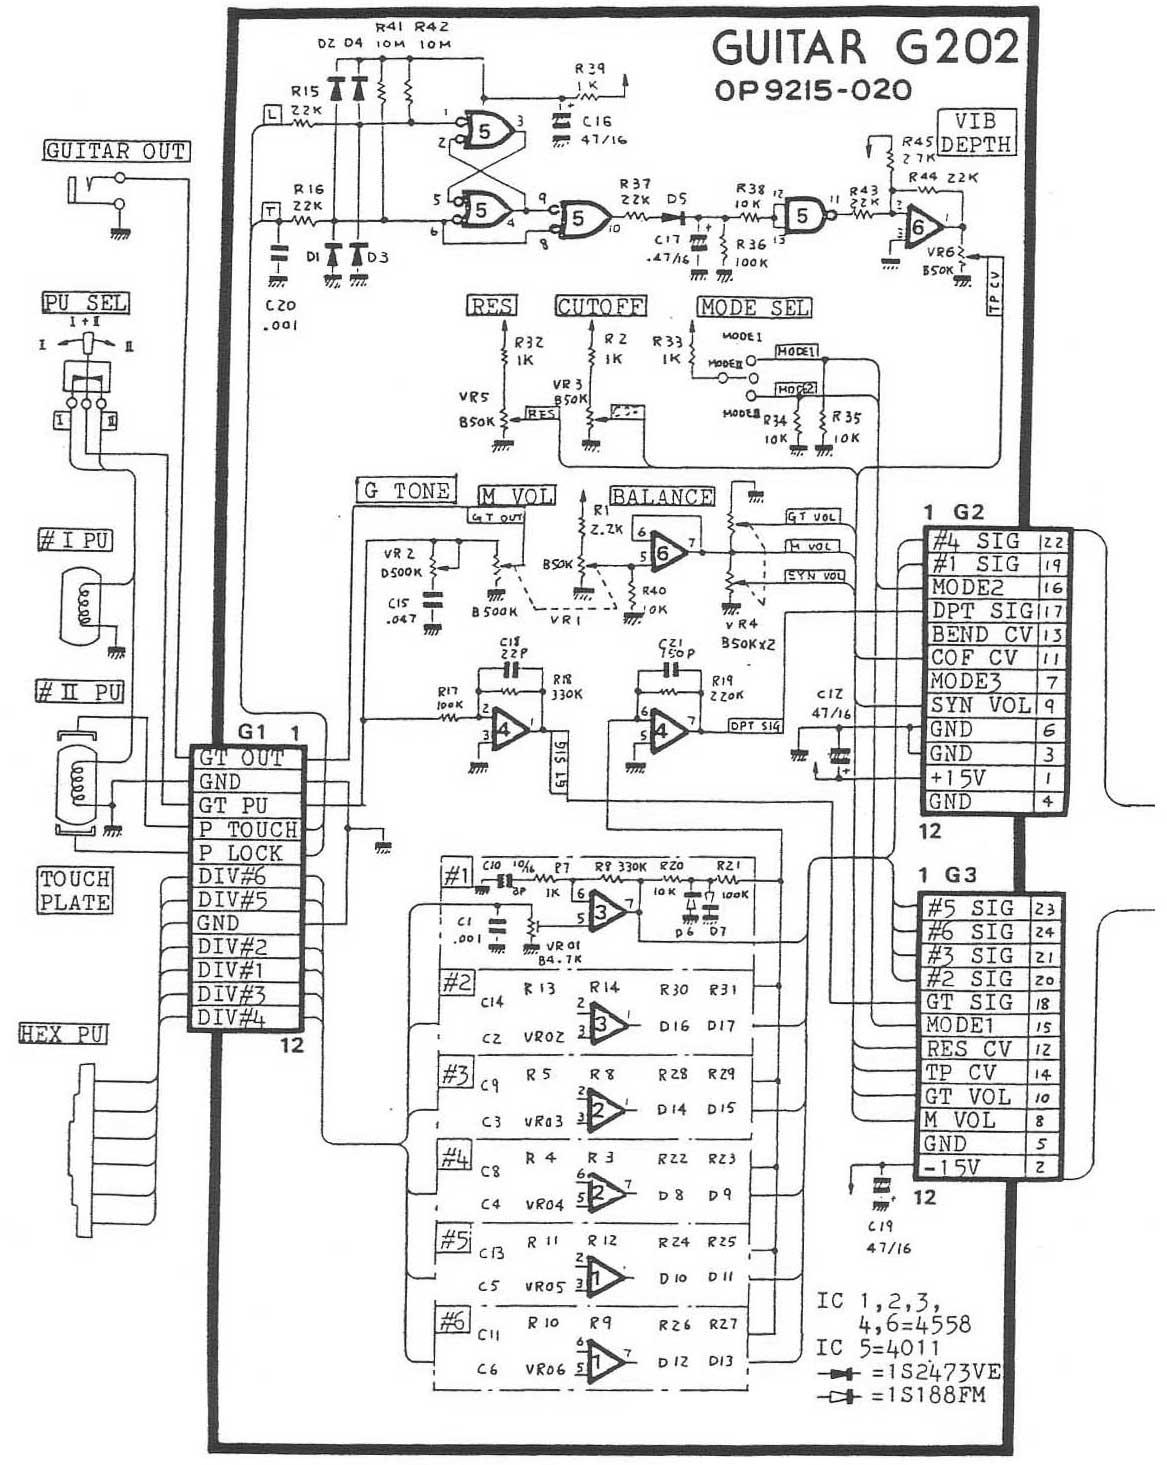 Roland G 707 Vintage Roland Guitar Synthesizer Controller Gr 700 Hex Fuzz Polydistortion